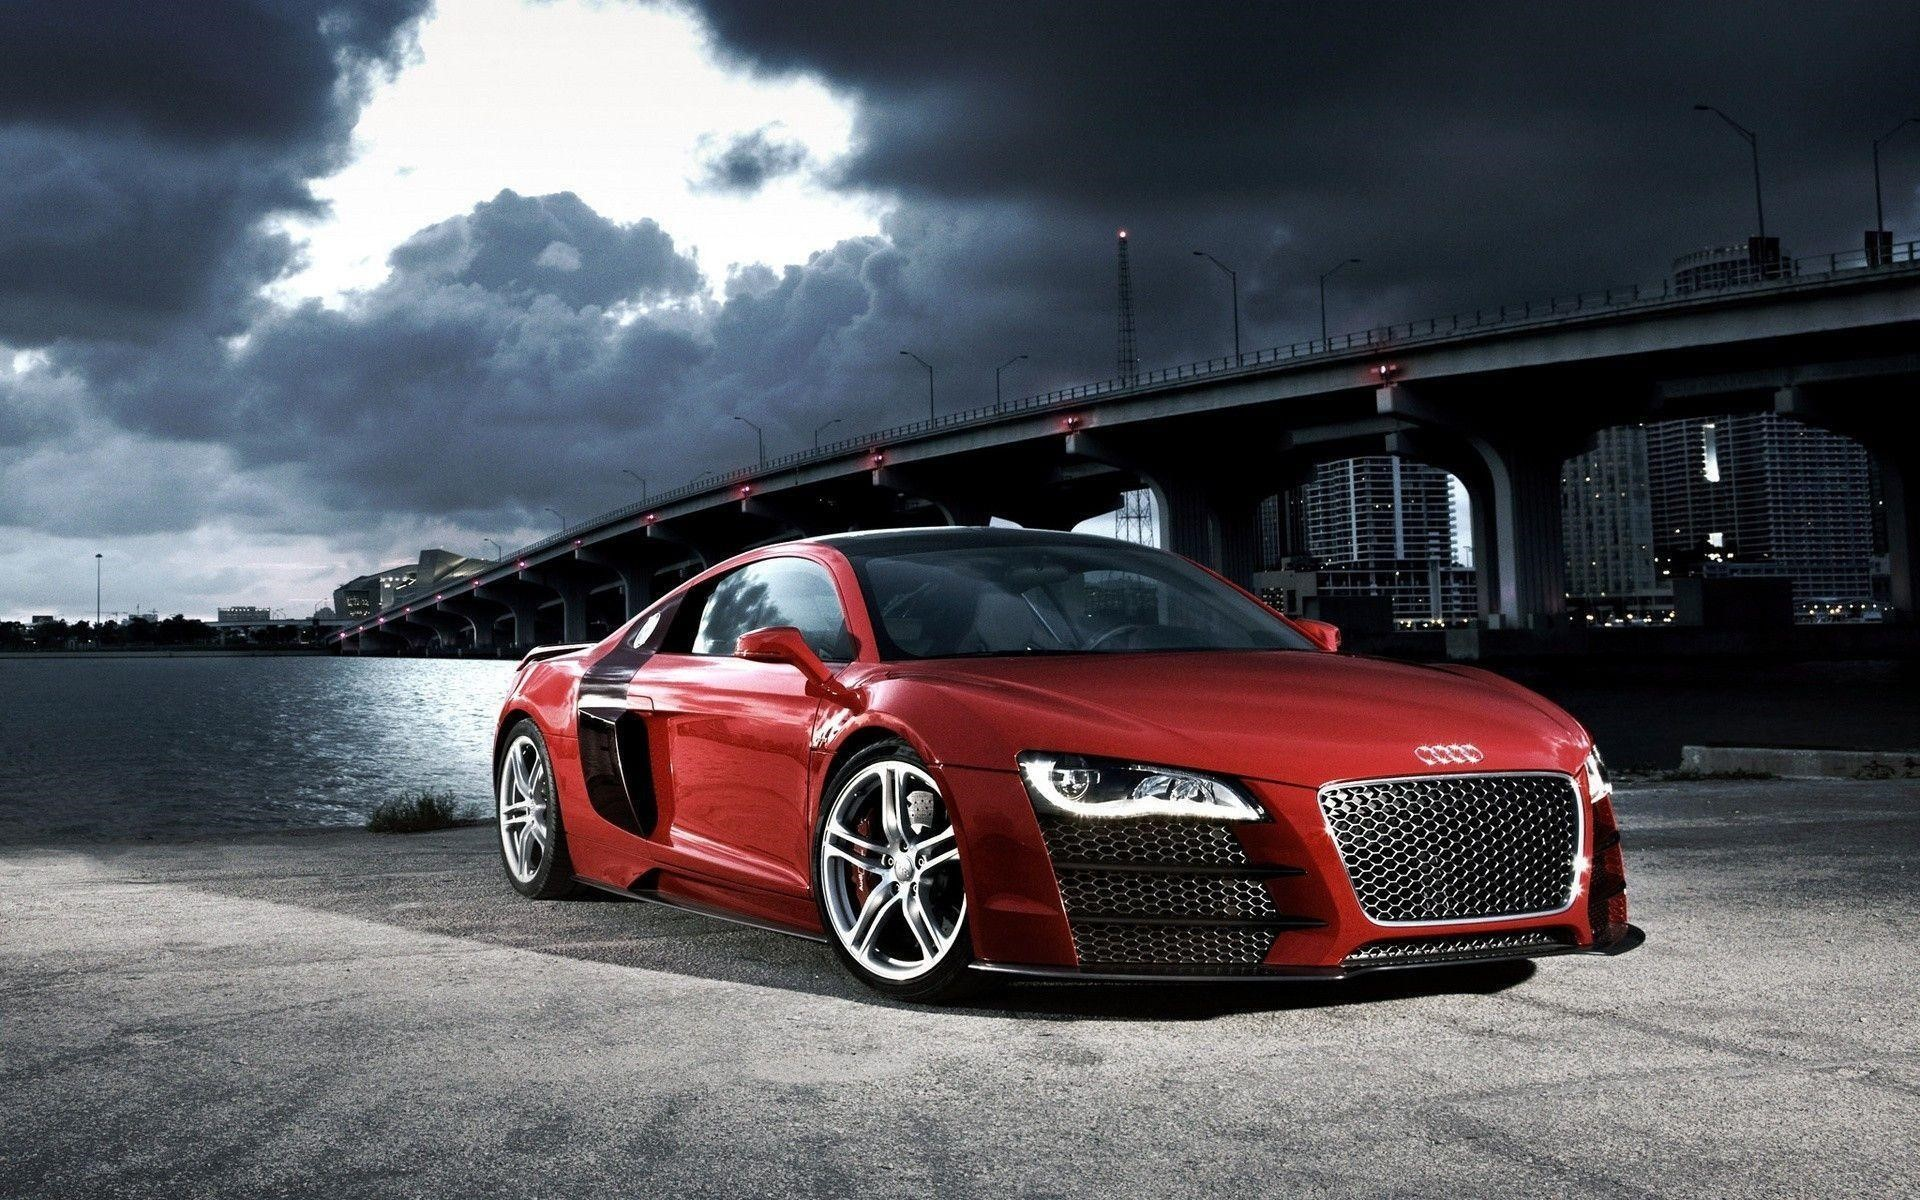 Audi R8 Android Duvar Kağıdı